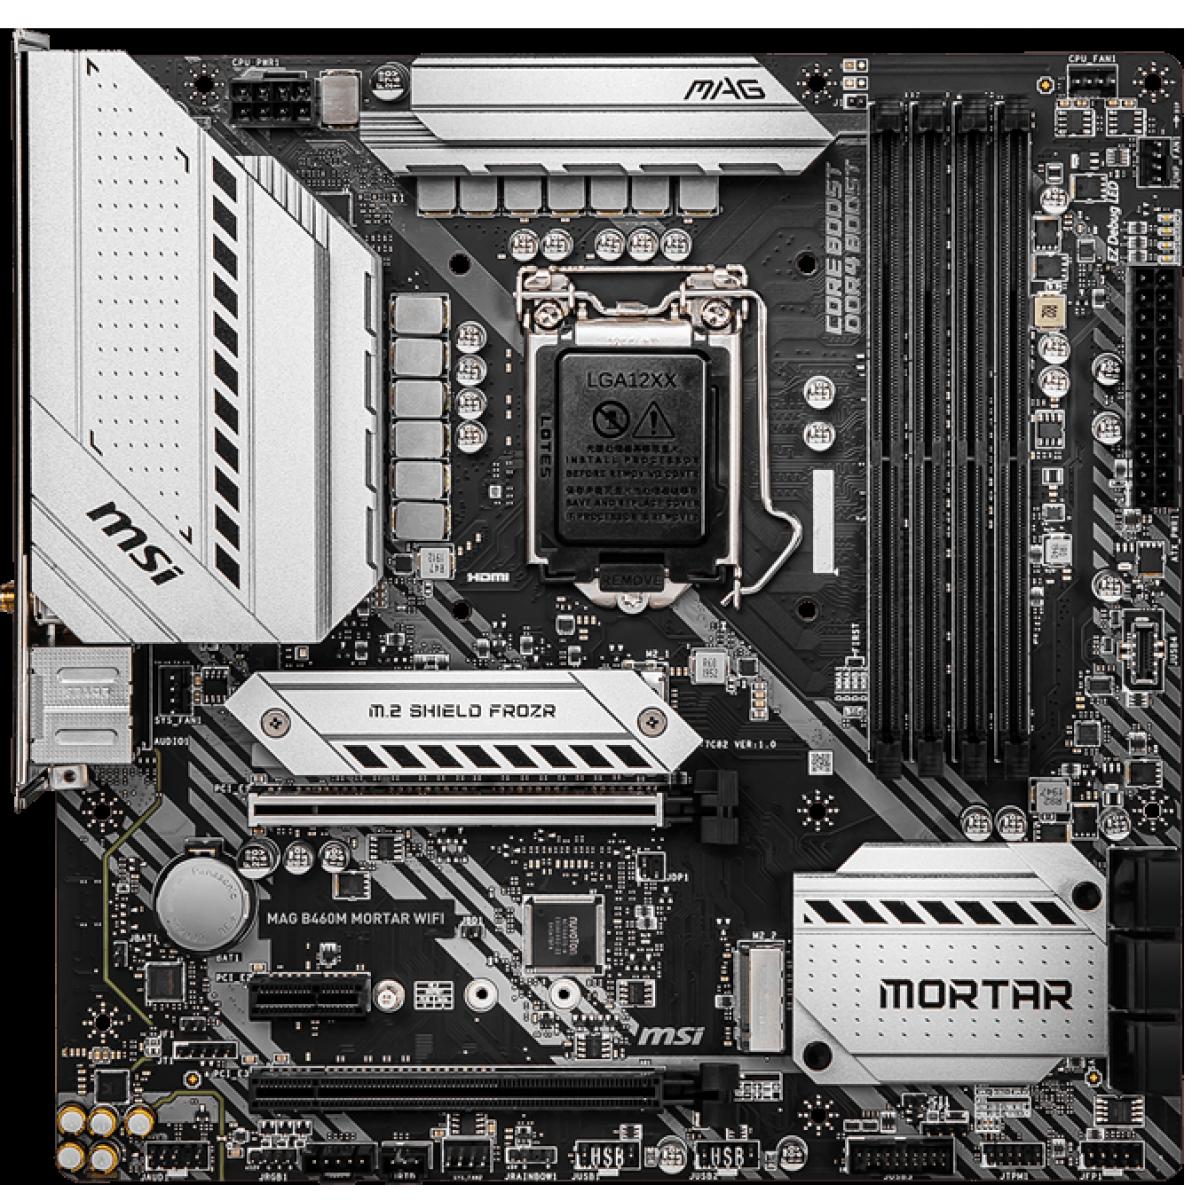 Placa Mãe MSI MAG B460M Mortar WIFI, Chipset B460, INTEL LGA 1200, mATX, DDR4